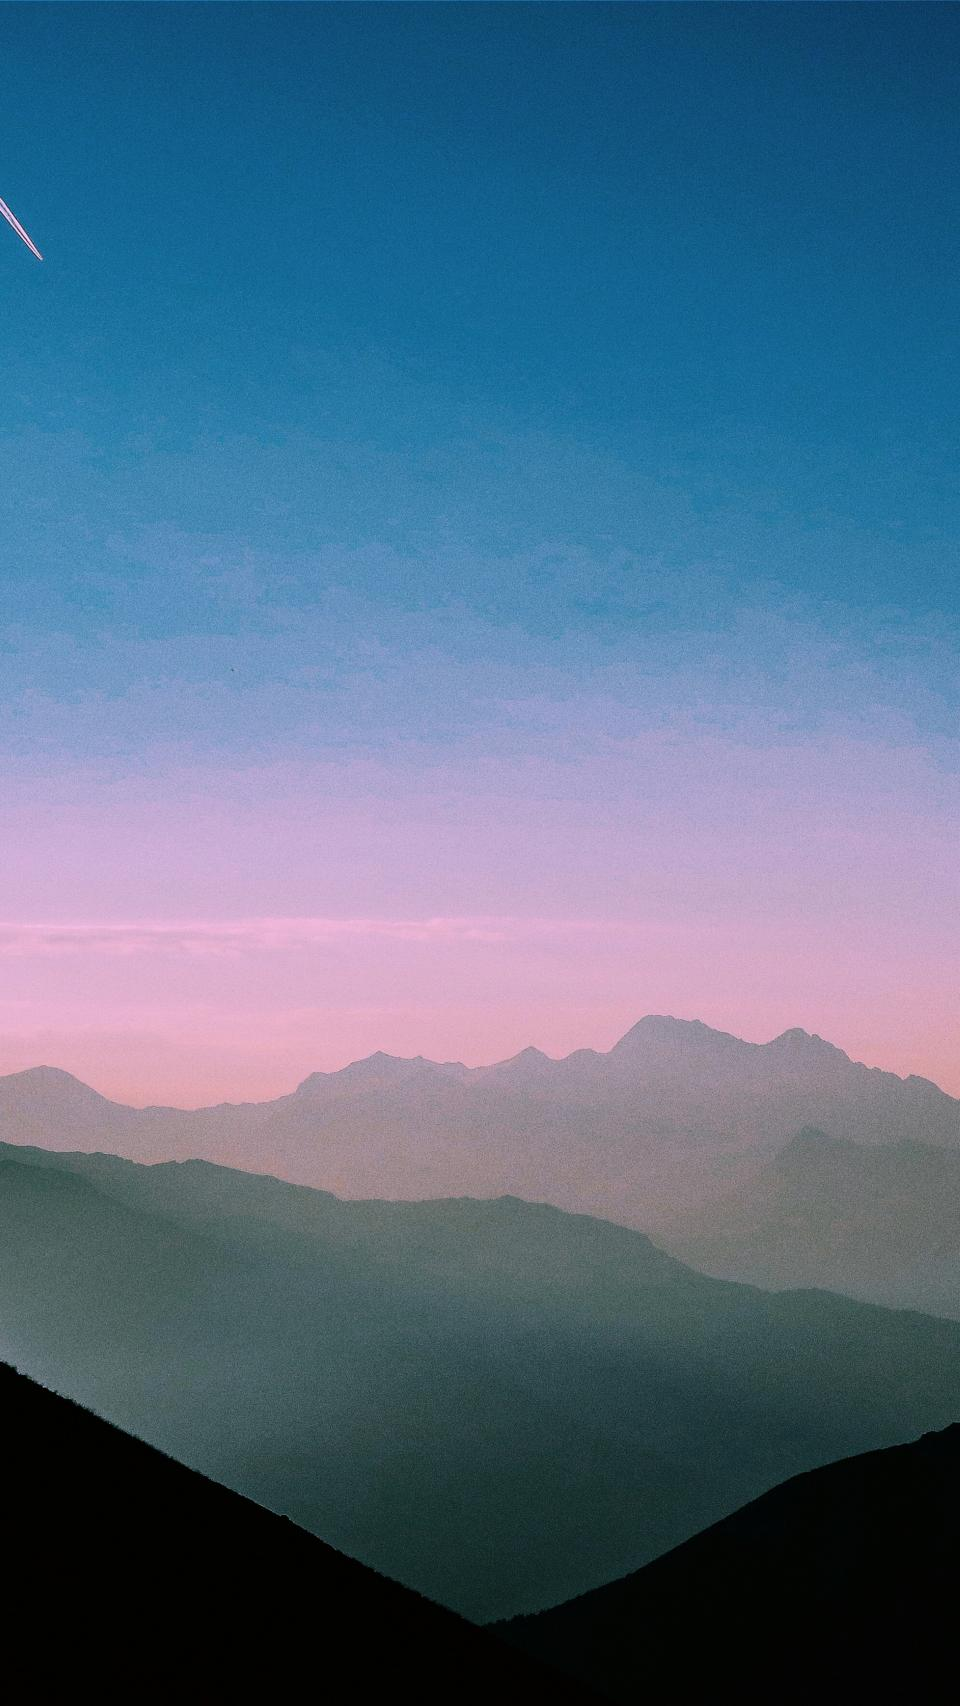 nature, landscape, mountains, summit, peaks, sky, horizon, clouds, gradient, shadows, silhouette